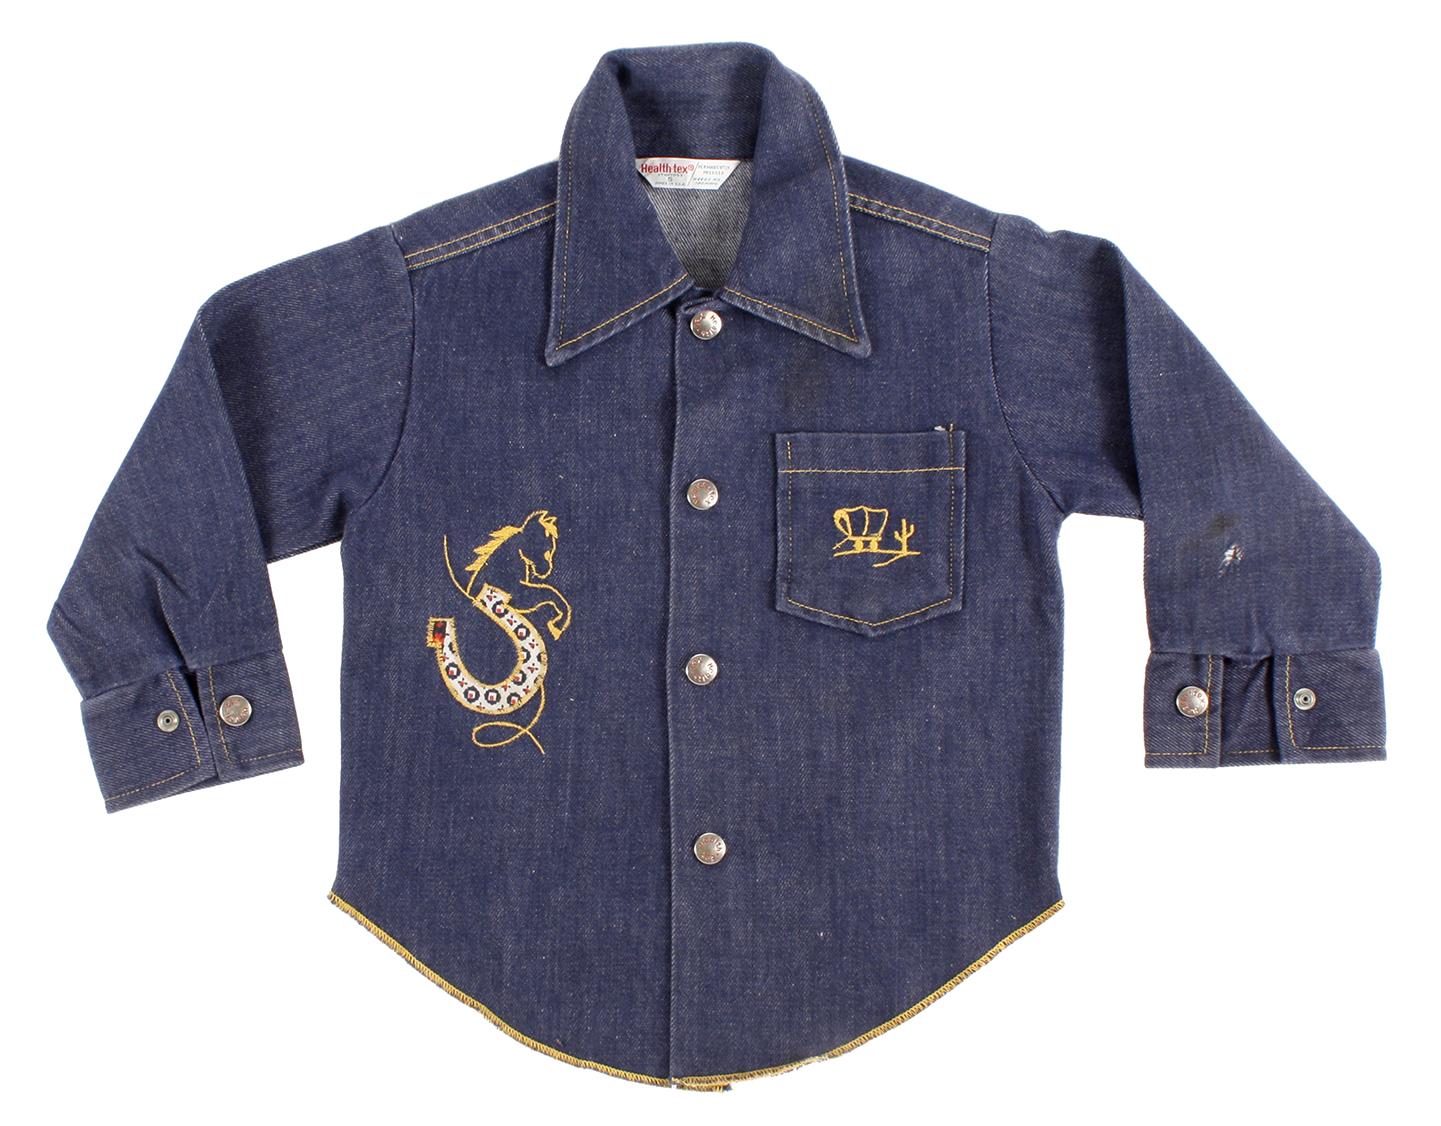 kids HEALTH TEX, denim shirt with embroidery